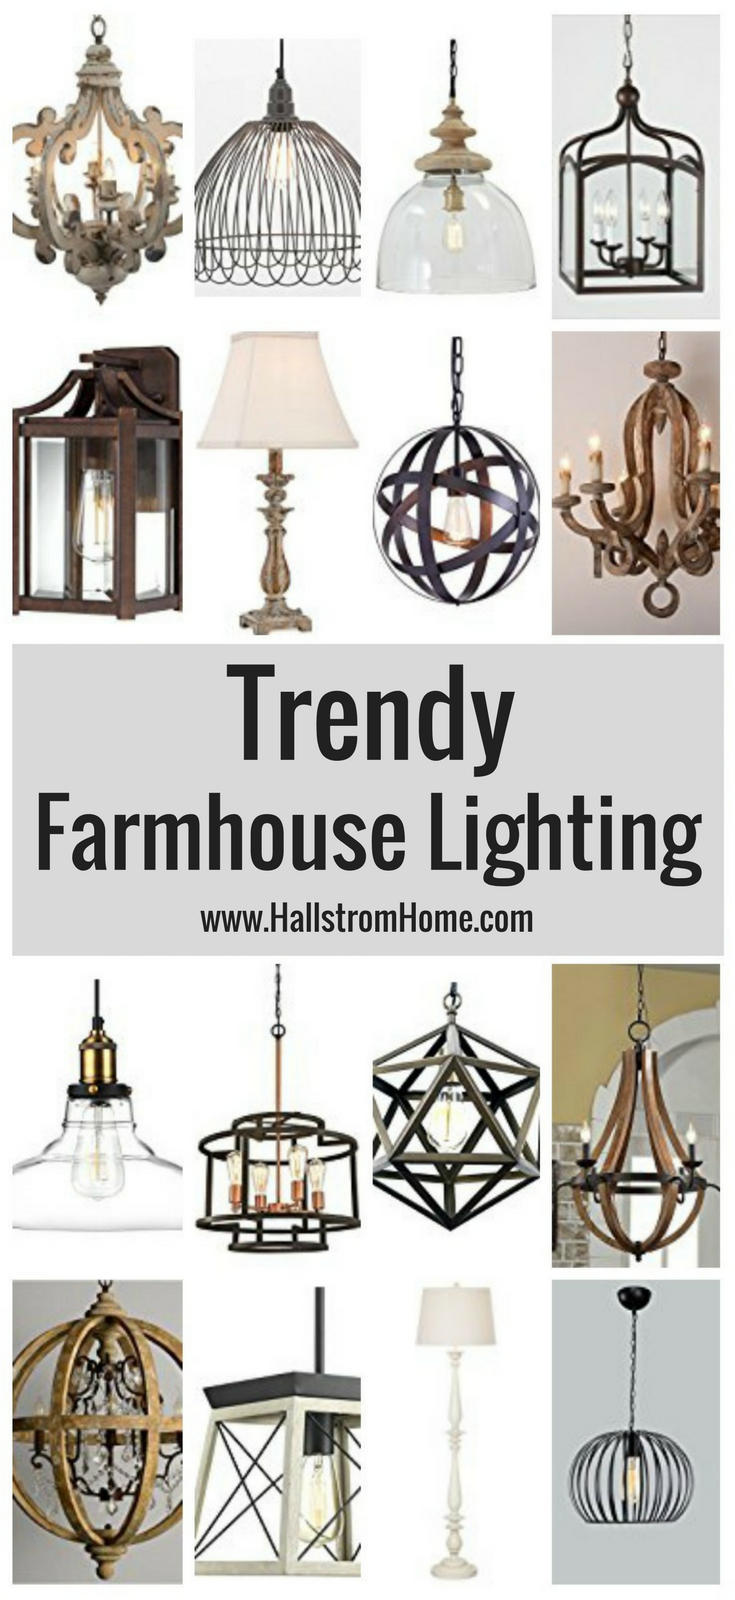 The Best Farmhouse Lighting On Amazon Hallstrom Home Farmhouse Lighting Apartment Lighting Farmhouse Dining Room Lighting